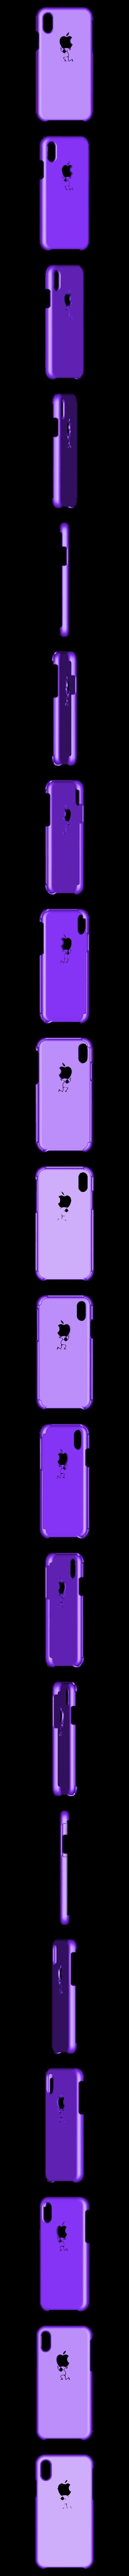 Heavy Apple.stl Download STL file Heavy Apple • Object to 3D print, Eternel06